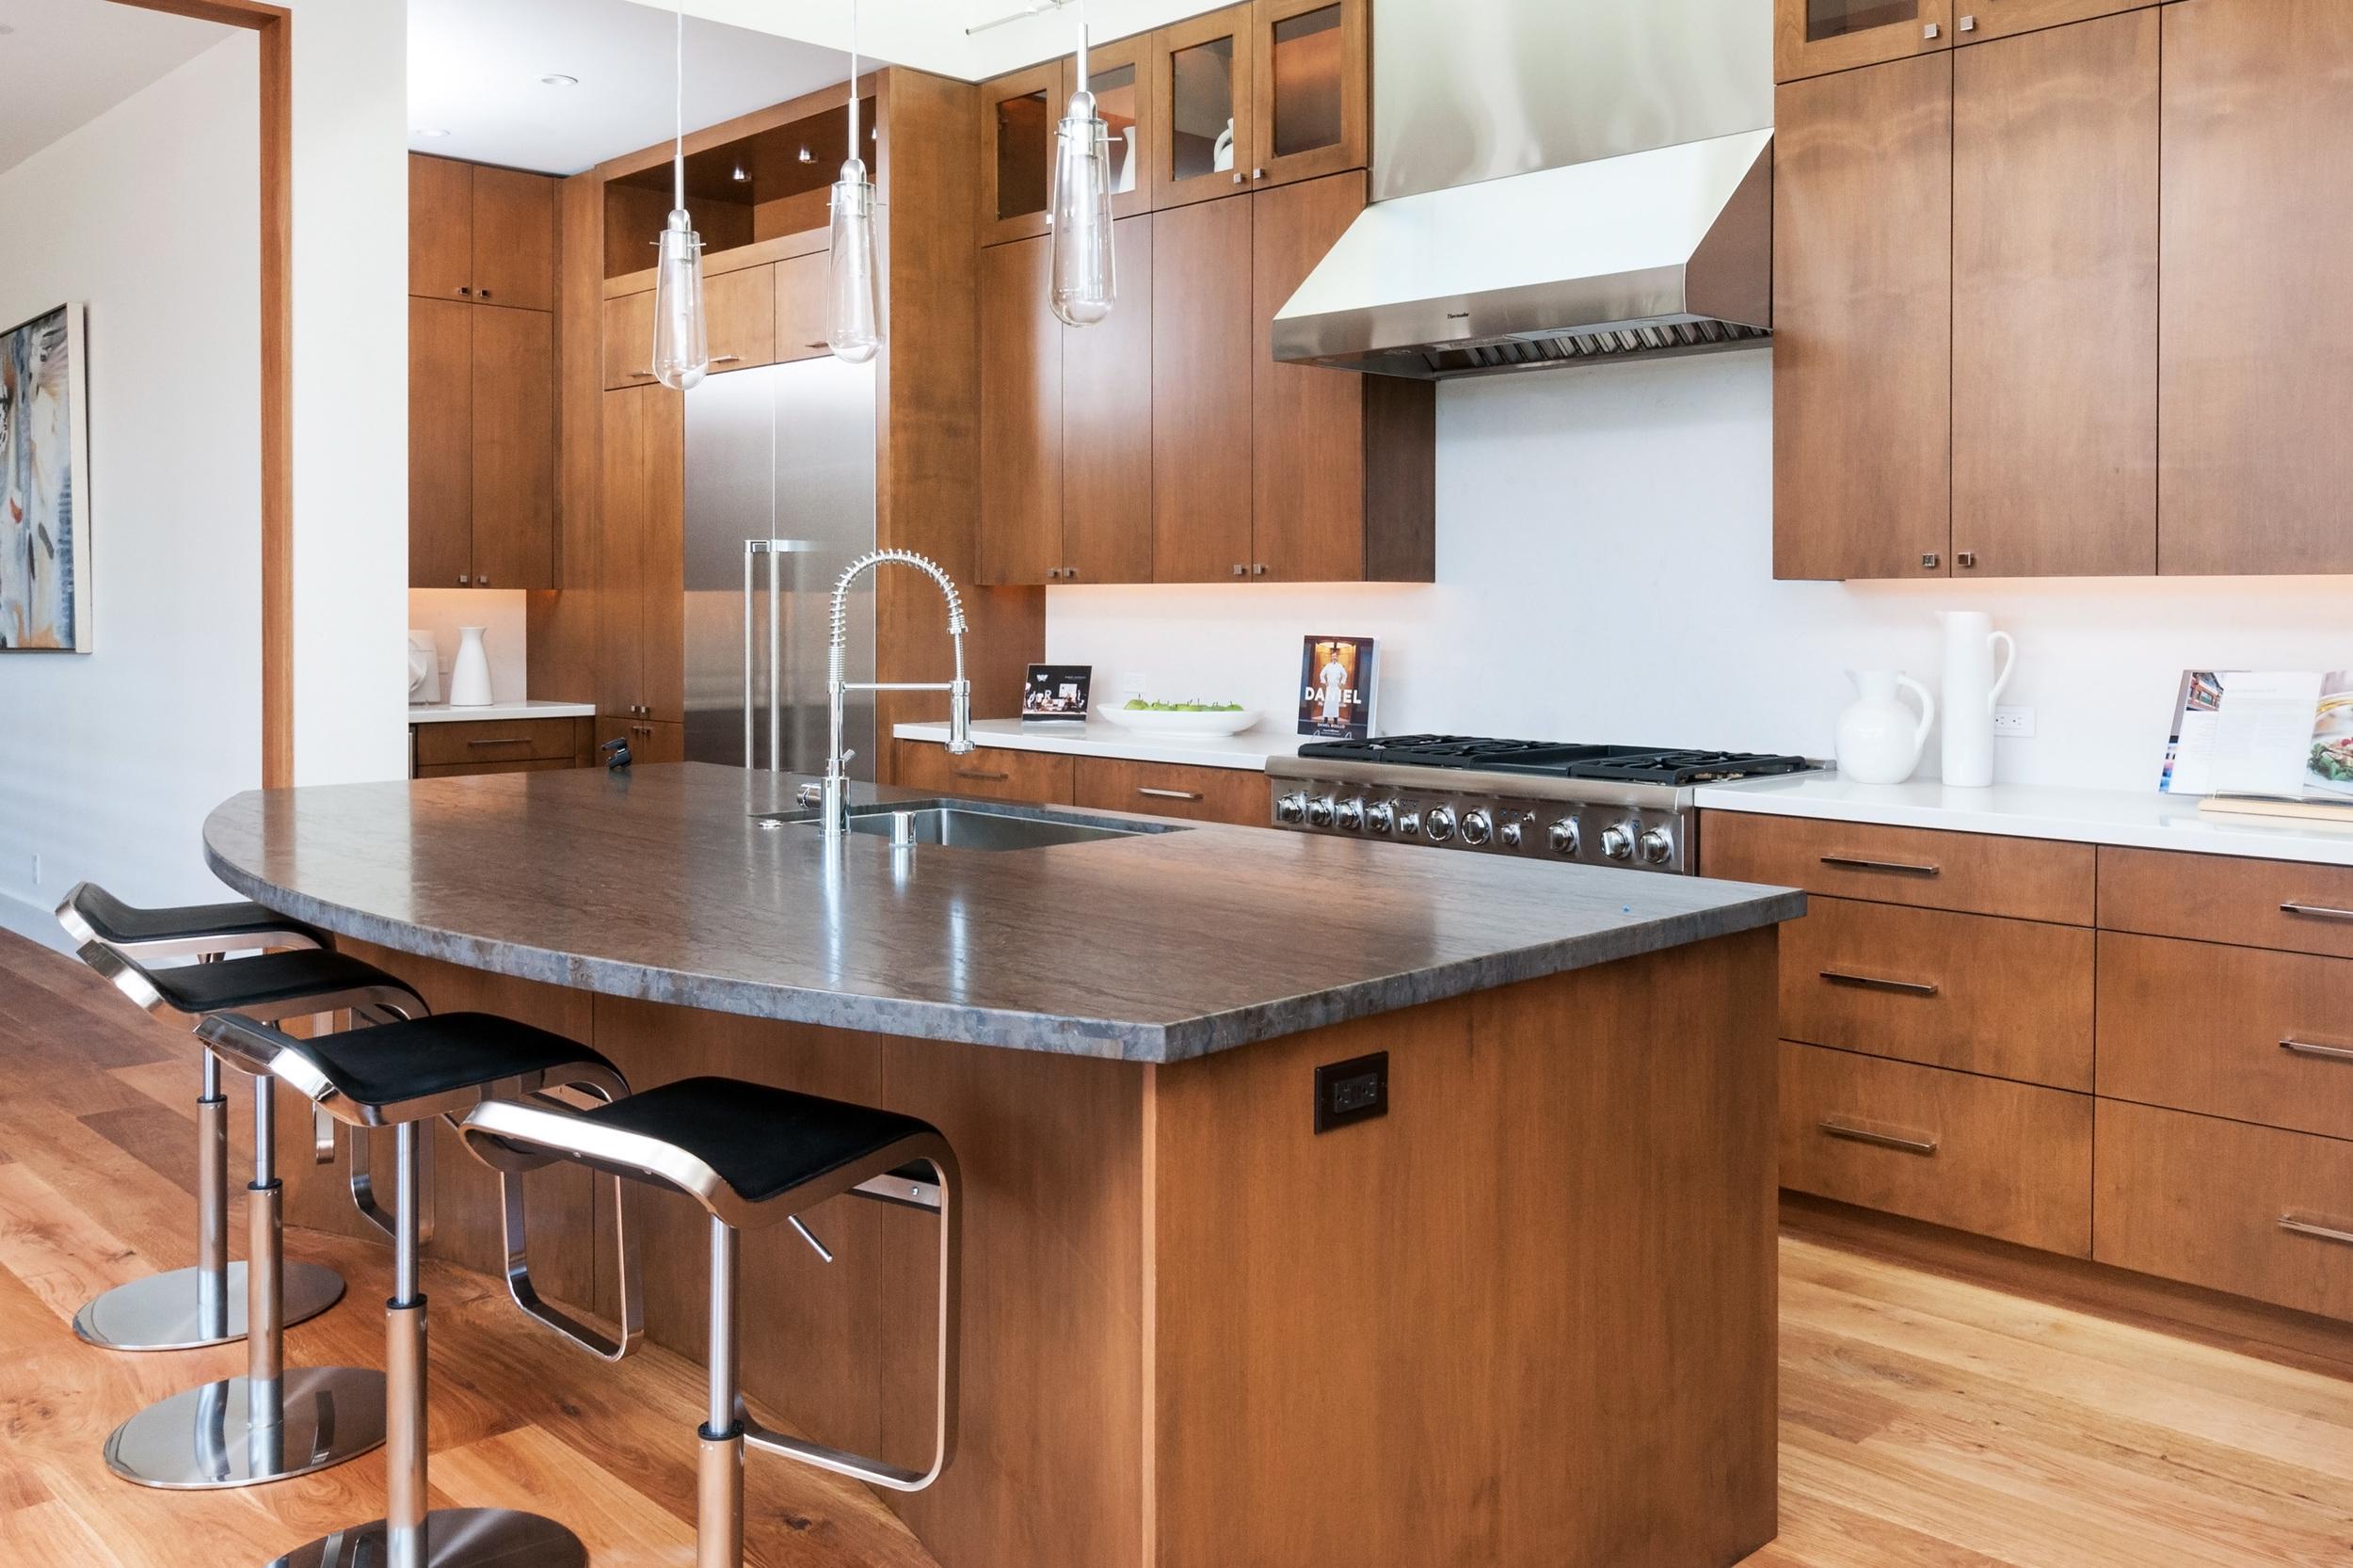 kitchen remodeling image 2